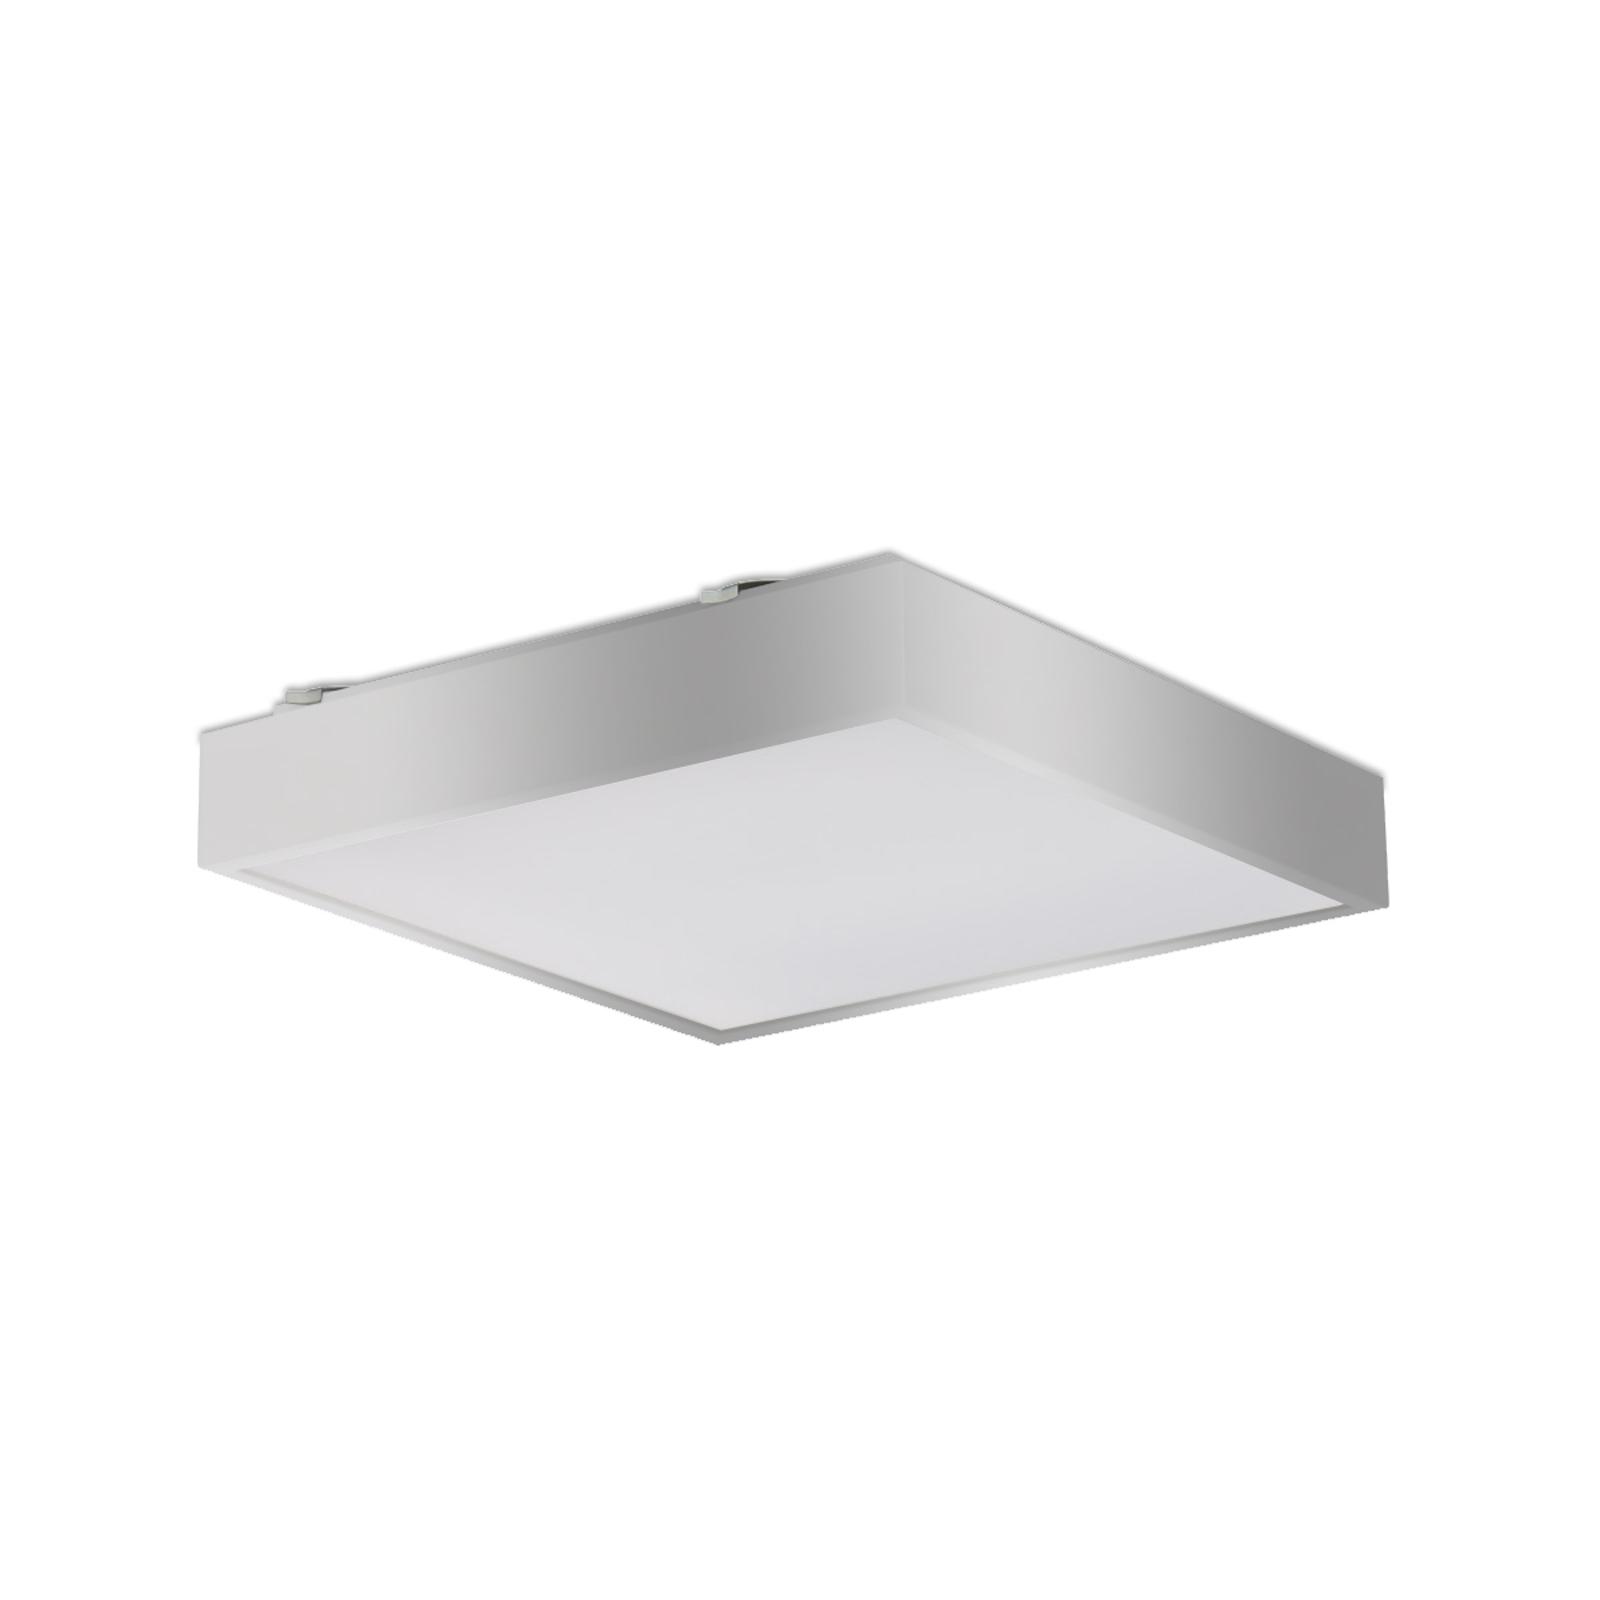 Q4 - LED-kattovalaisin hopea DALI